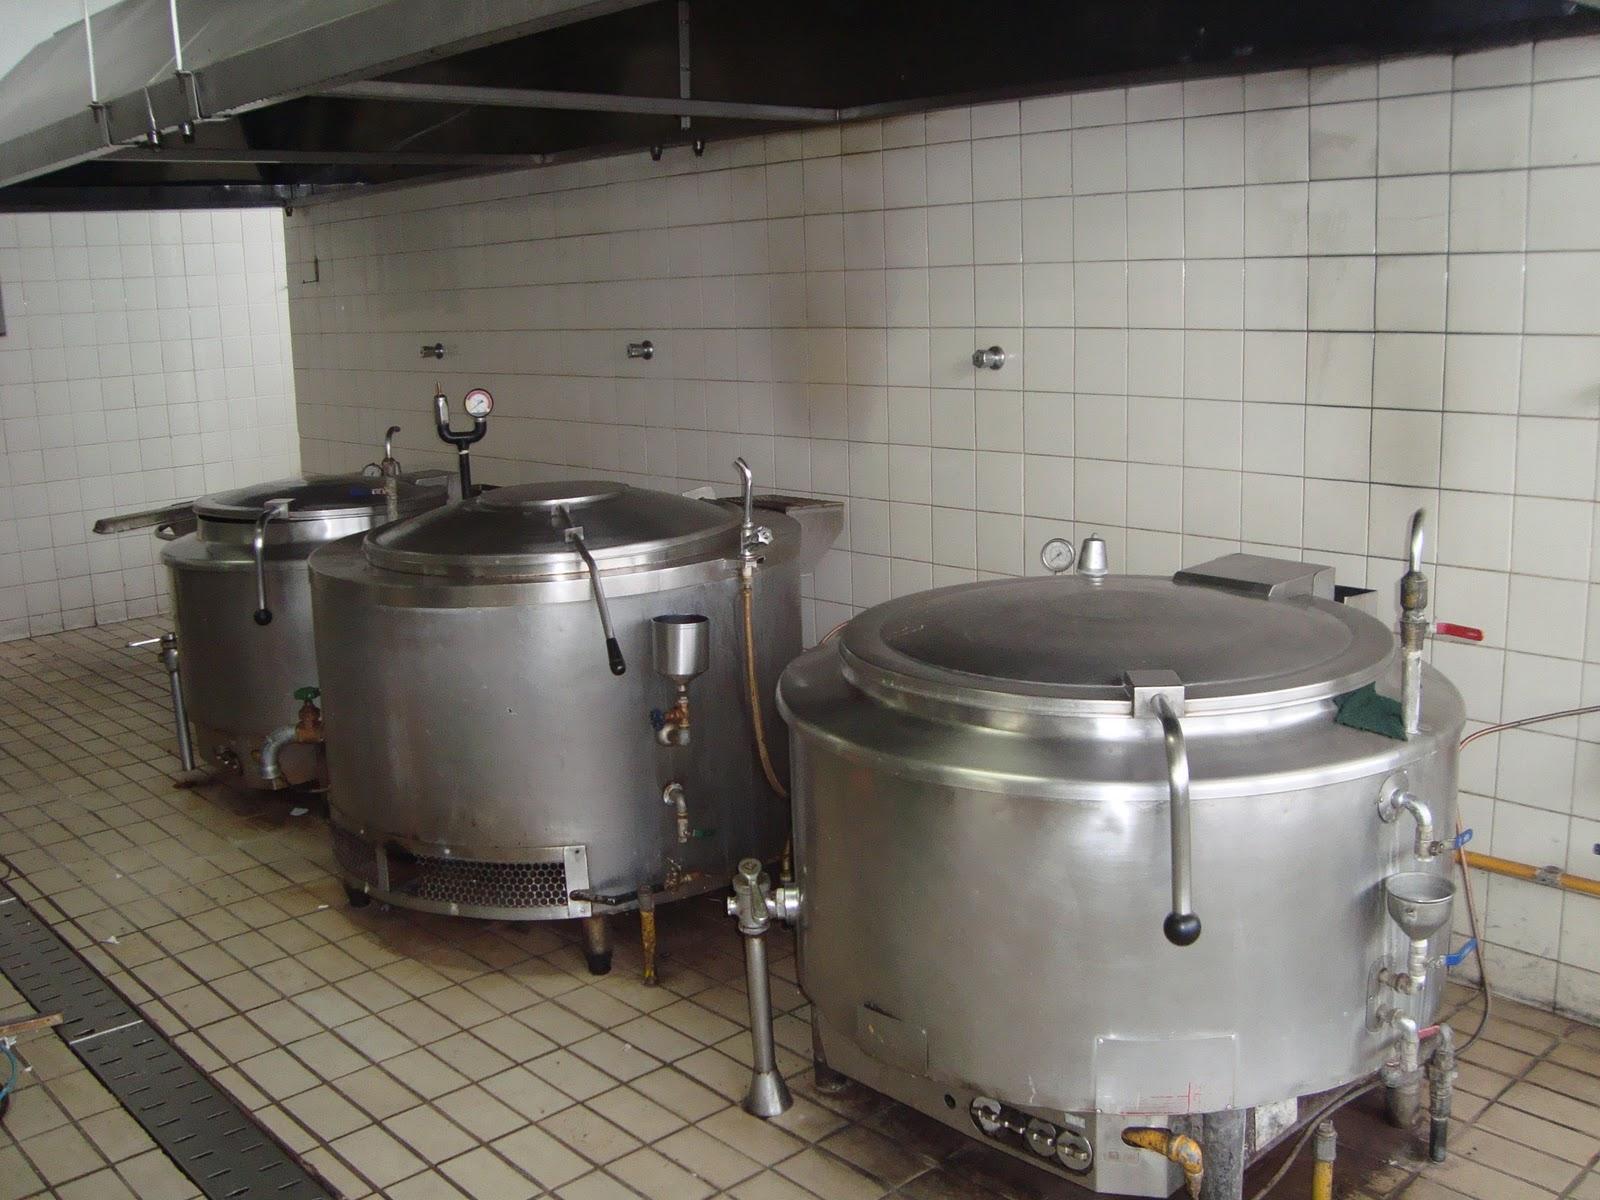 #665E4D LIMPEZATA: Limpeza cozinha industrial 1600x1200 px Projeto De Cozinha Industrial Normas #2911 imagens